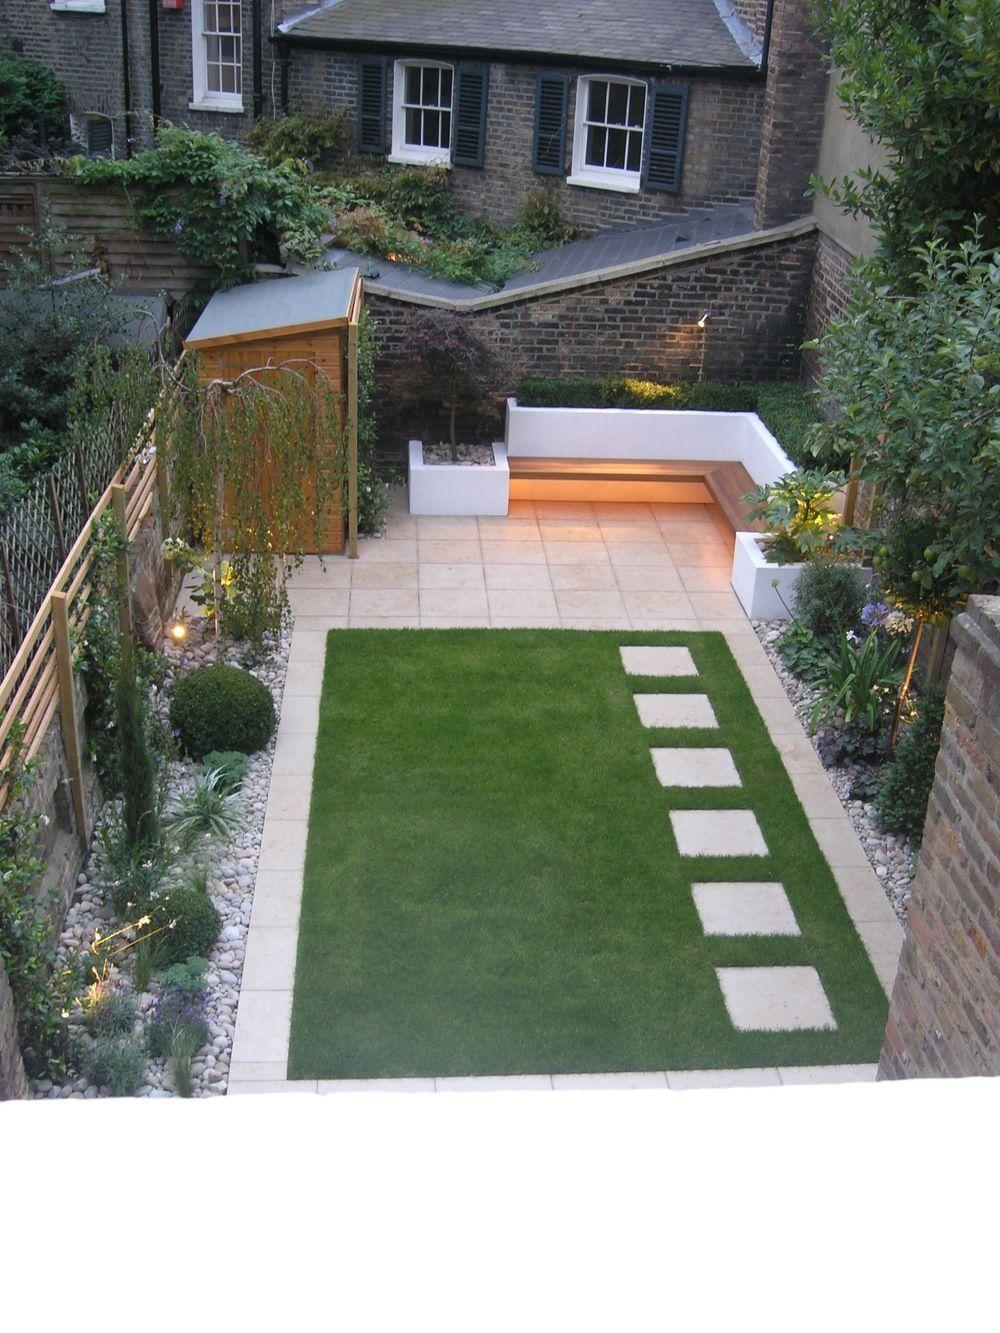 9 Easy Tips on Garden Design Ideas Low Maintenance | Back ... on Cheap Back Garden Ideas id=62724